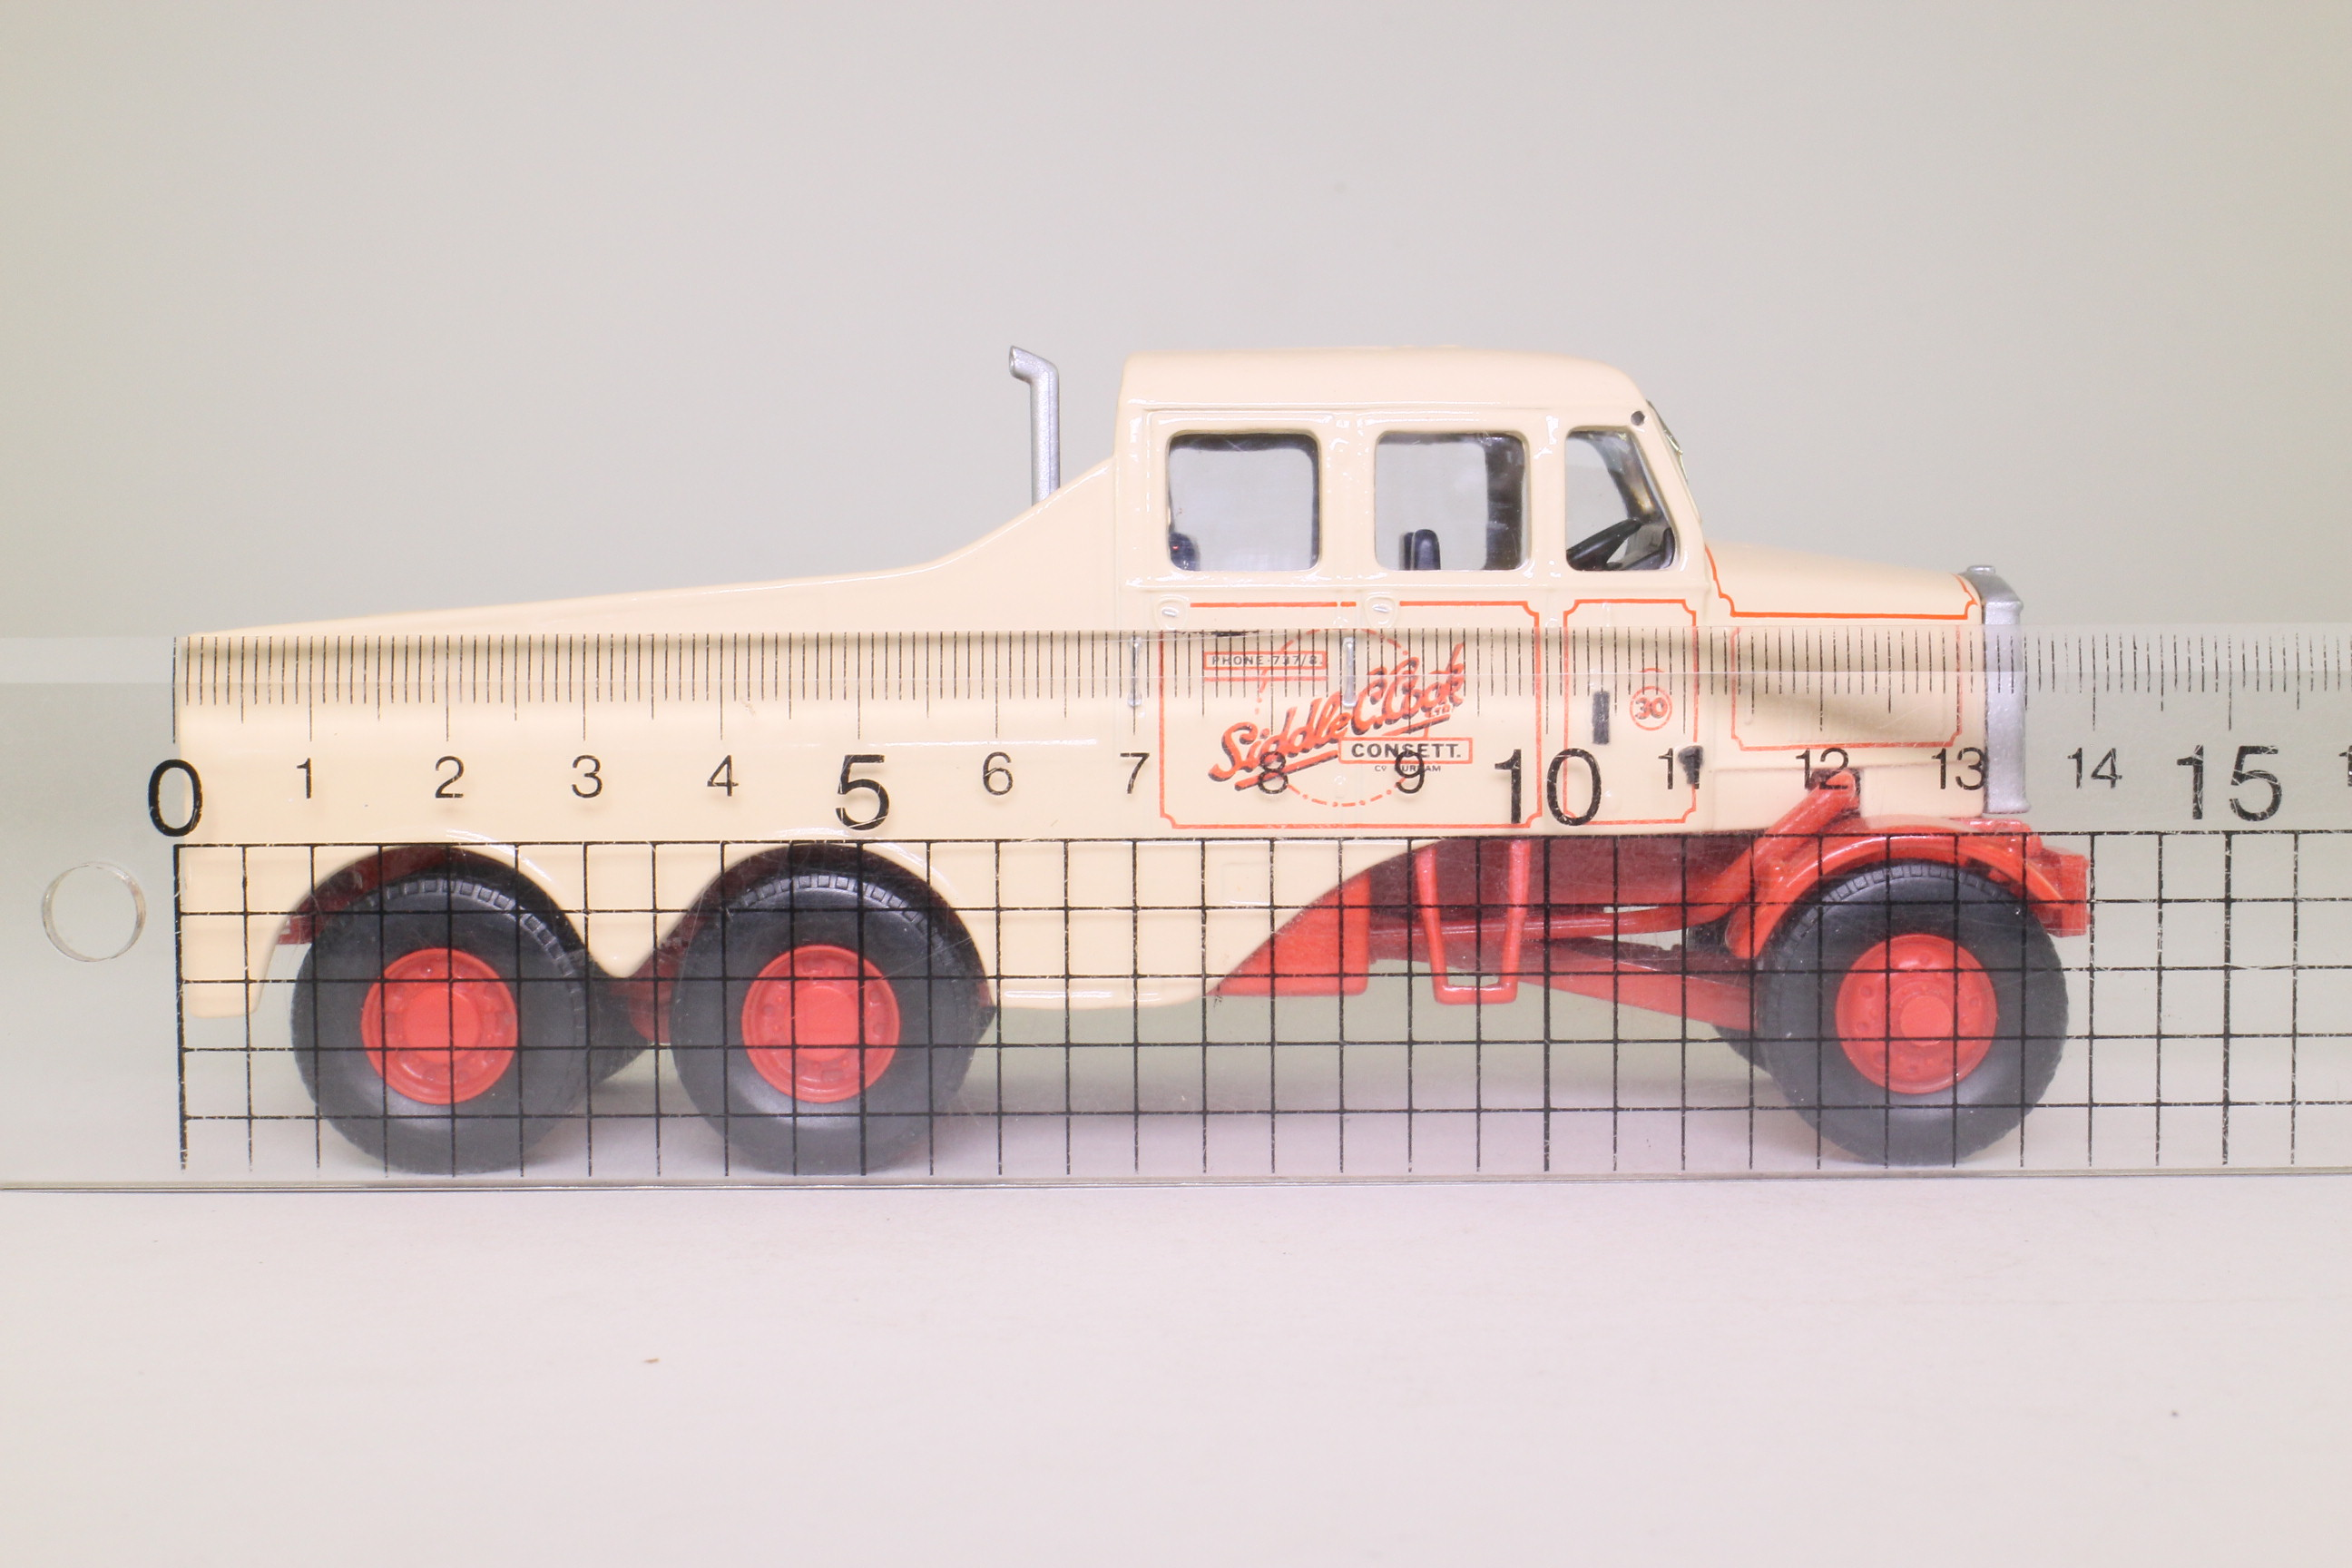 Corgi Cc11101 Scammell Constructor Ballast Tractor